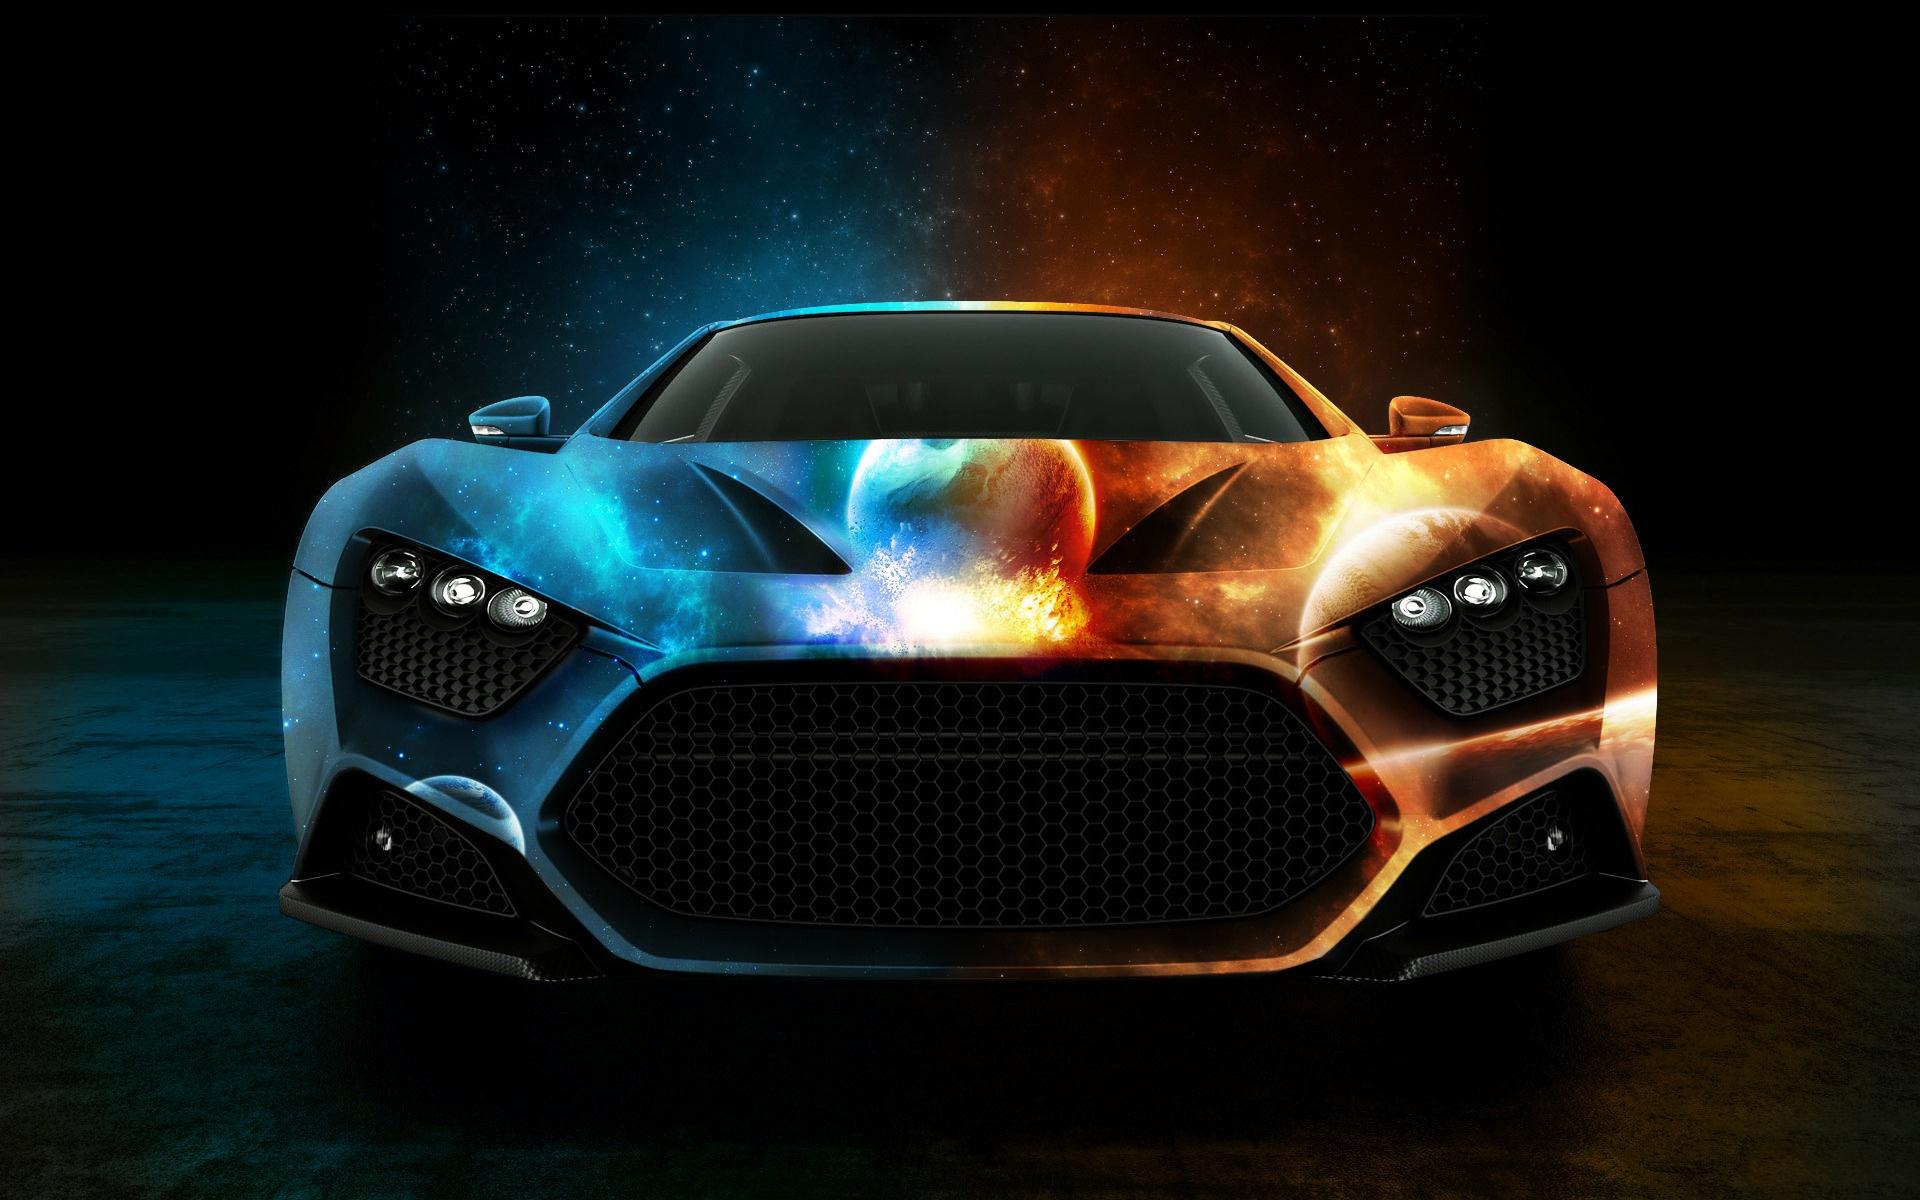 cool hot car desktop wallpaper download cool hot car wallpaper in hd 1920x1200